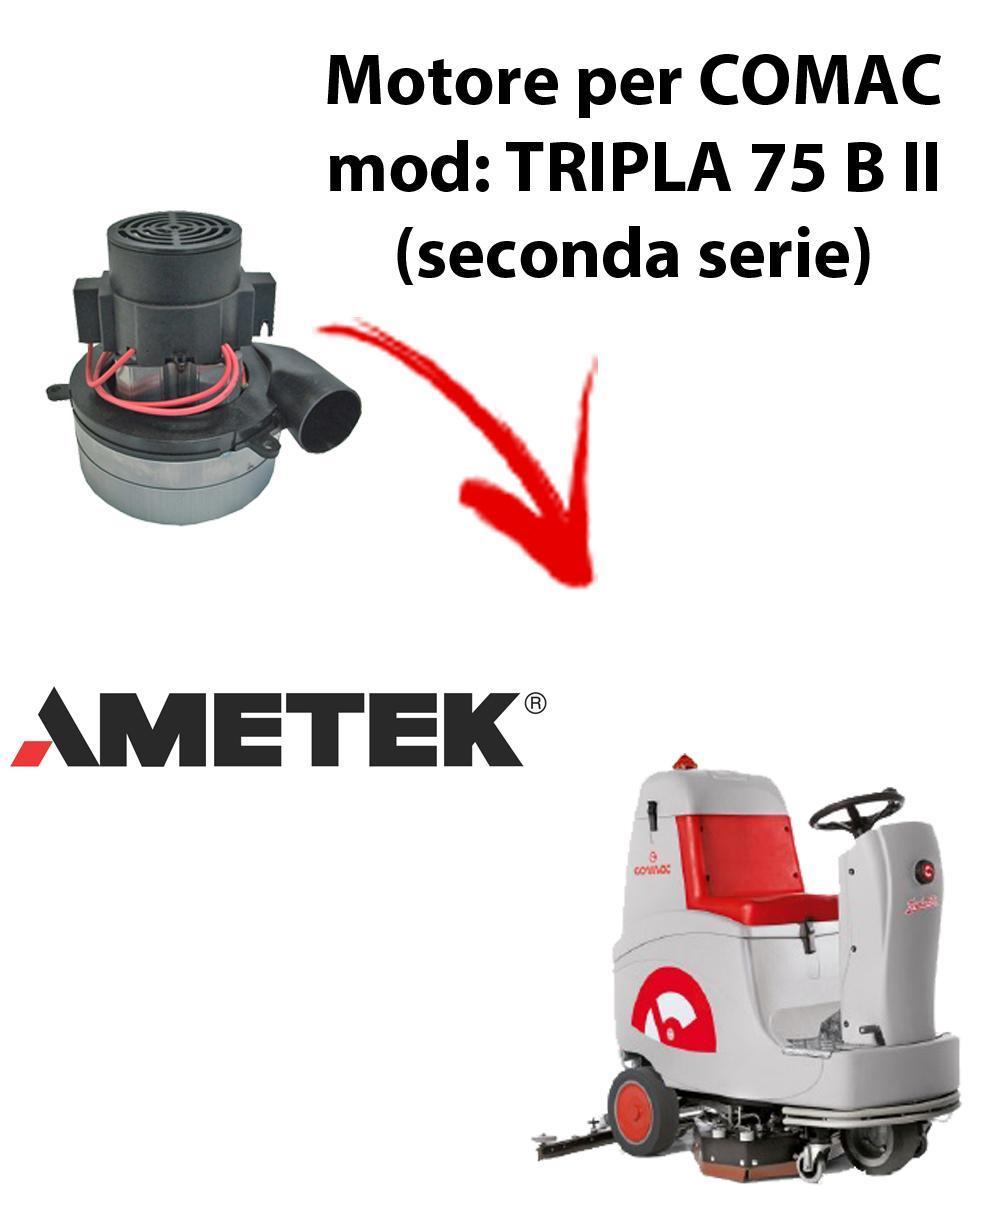 TRIPLA 75B II Motore de aspiración Ametek Italia  para fregadora Comac